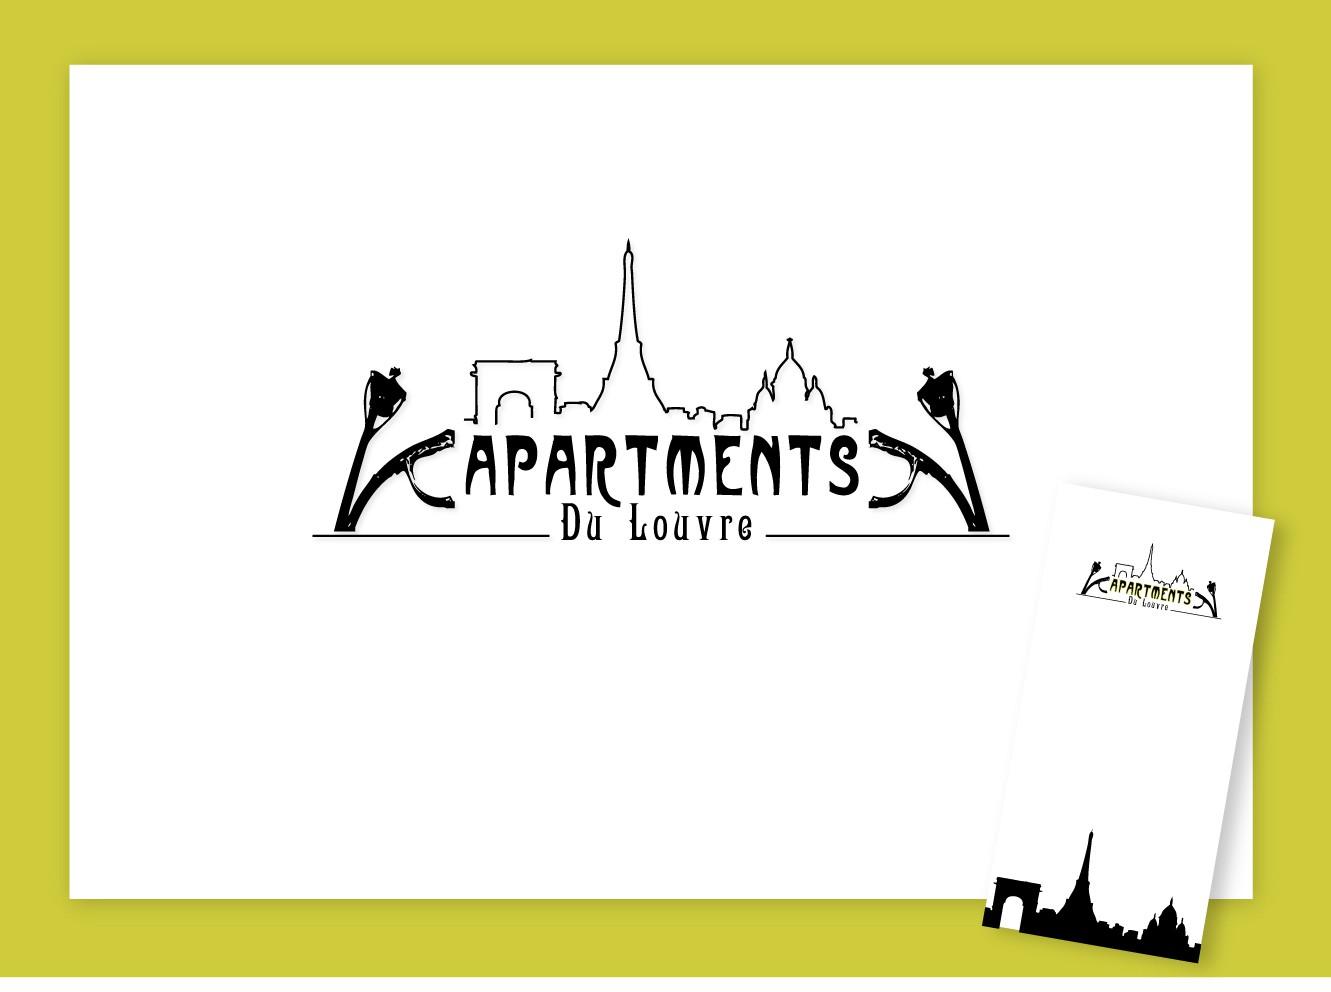 Apartments Du Louvre needs a new logo